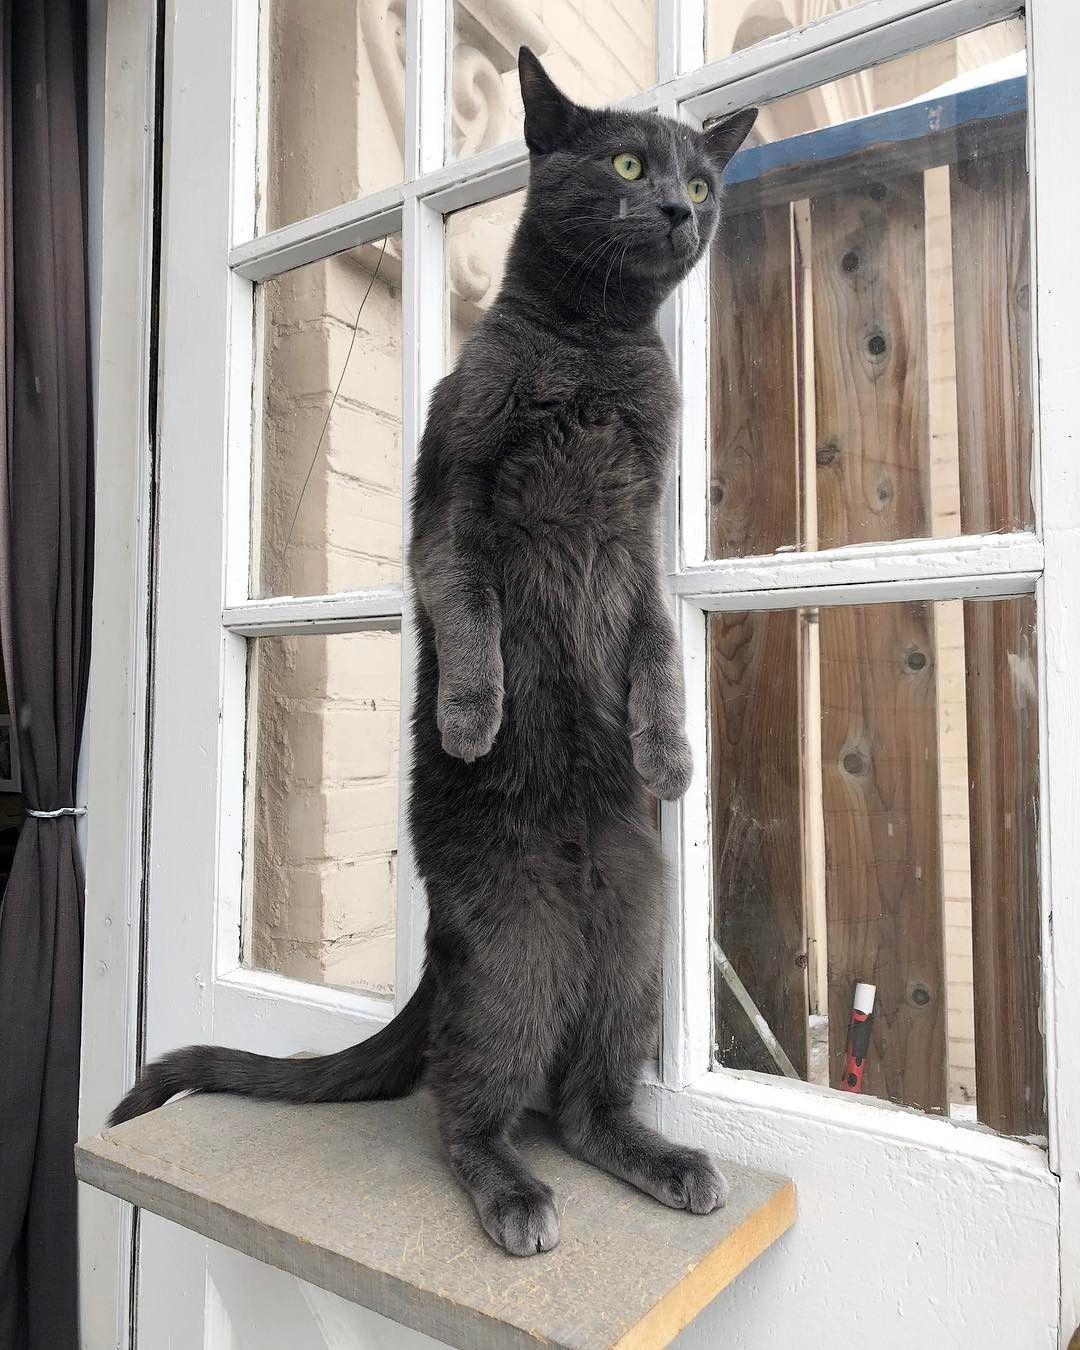 Obrázky pěkných kočiček